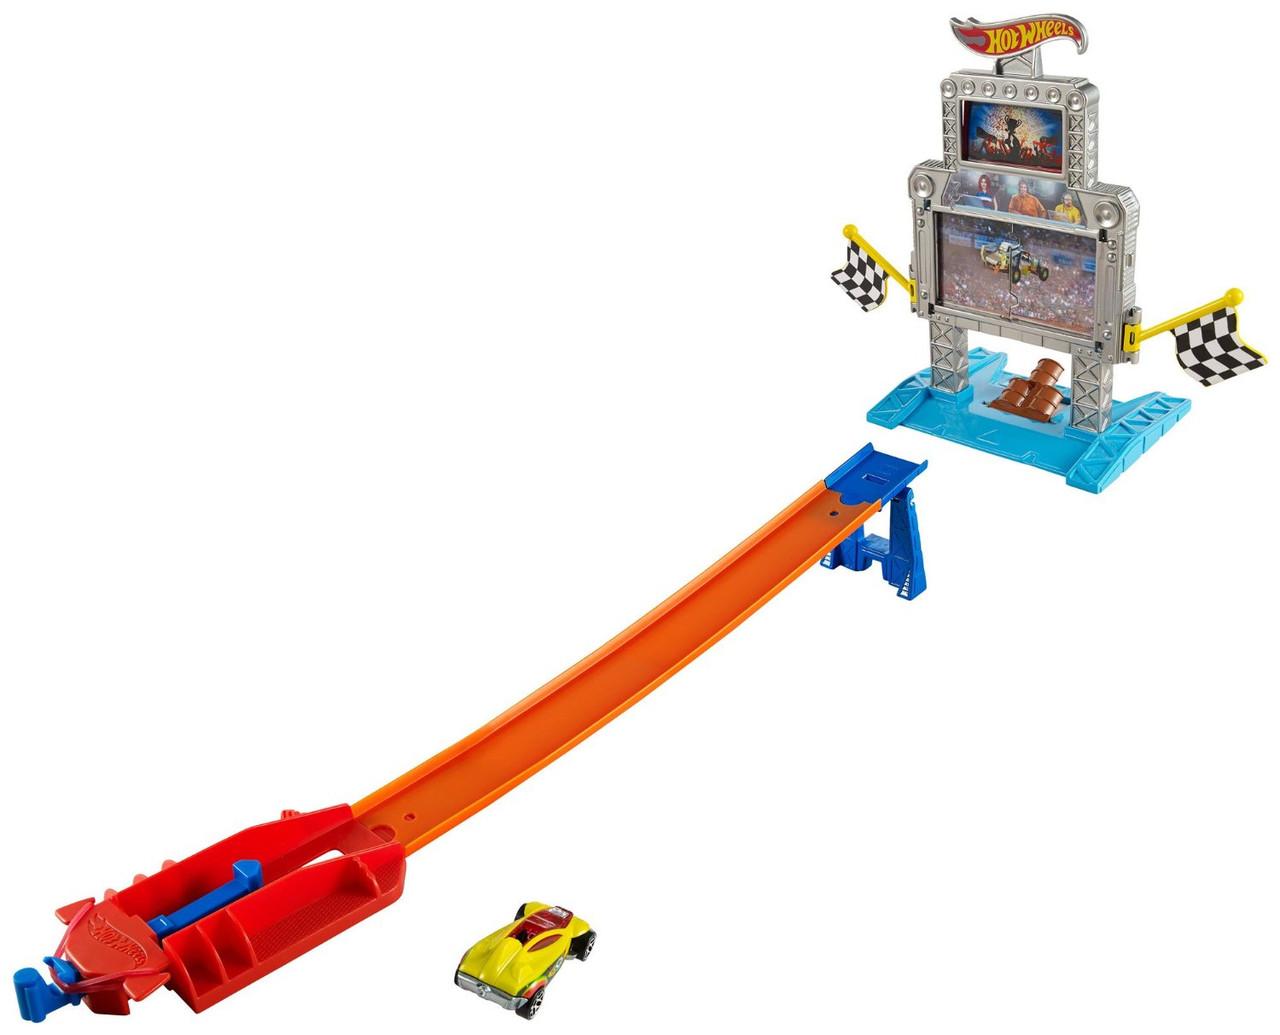 Трек Хот Вилс Тройная мишень Hot Wheels Triple Target Takedown Track Set